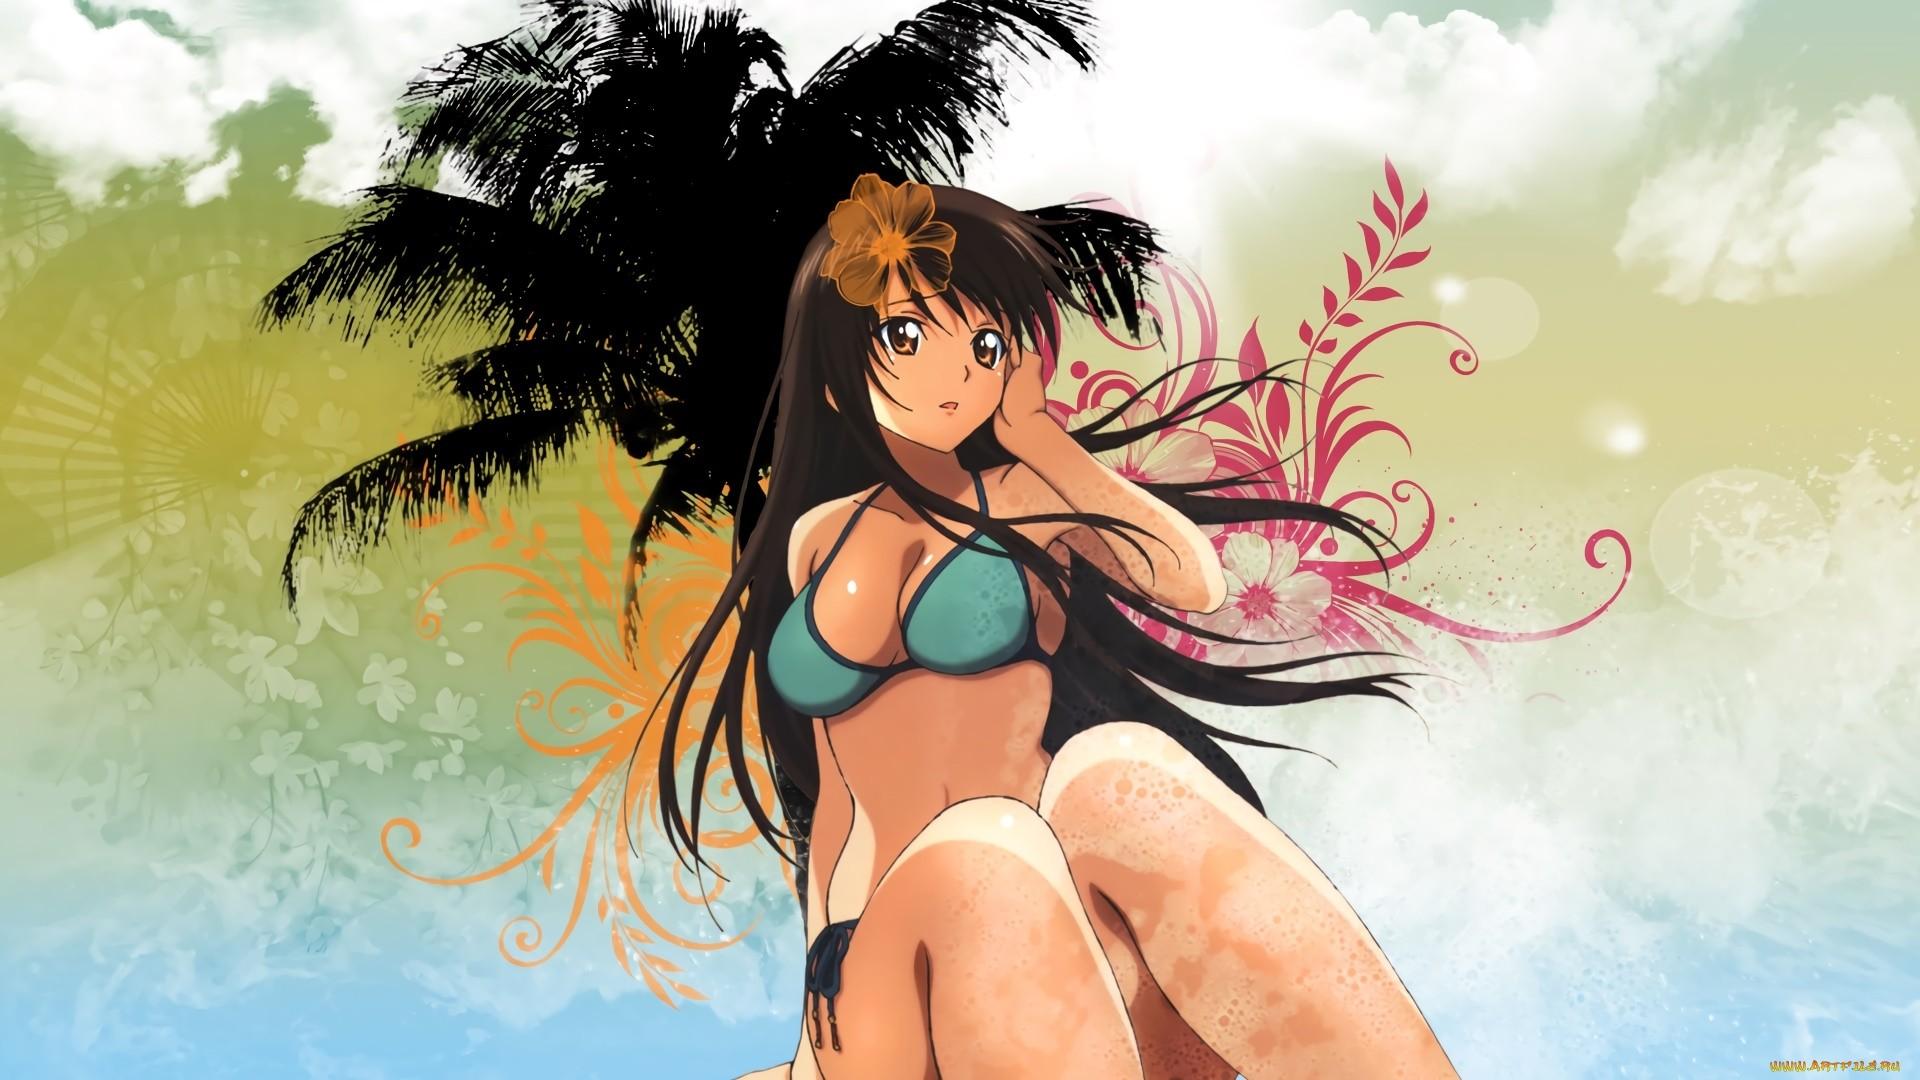 Anime Bikini New Wallpaper